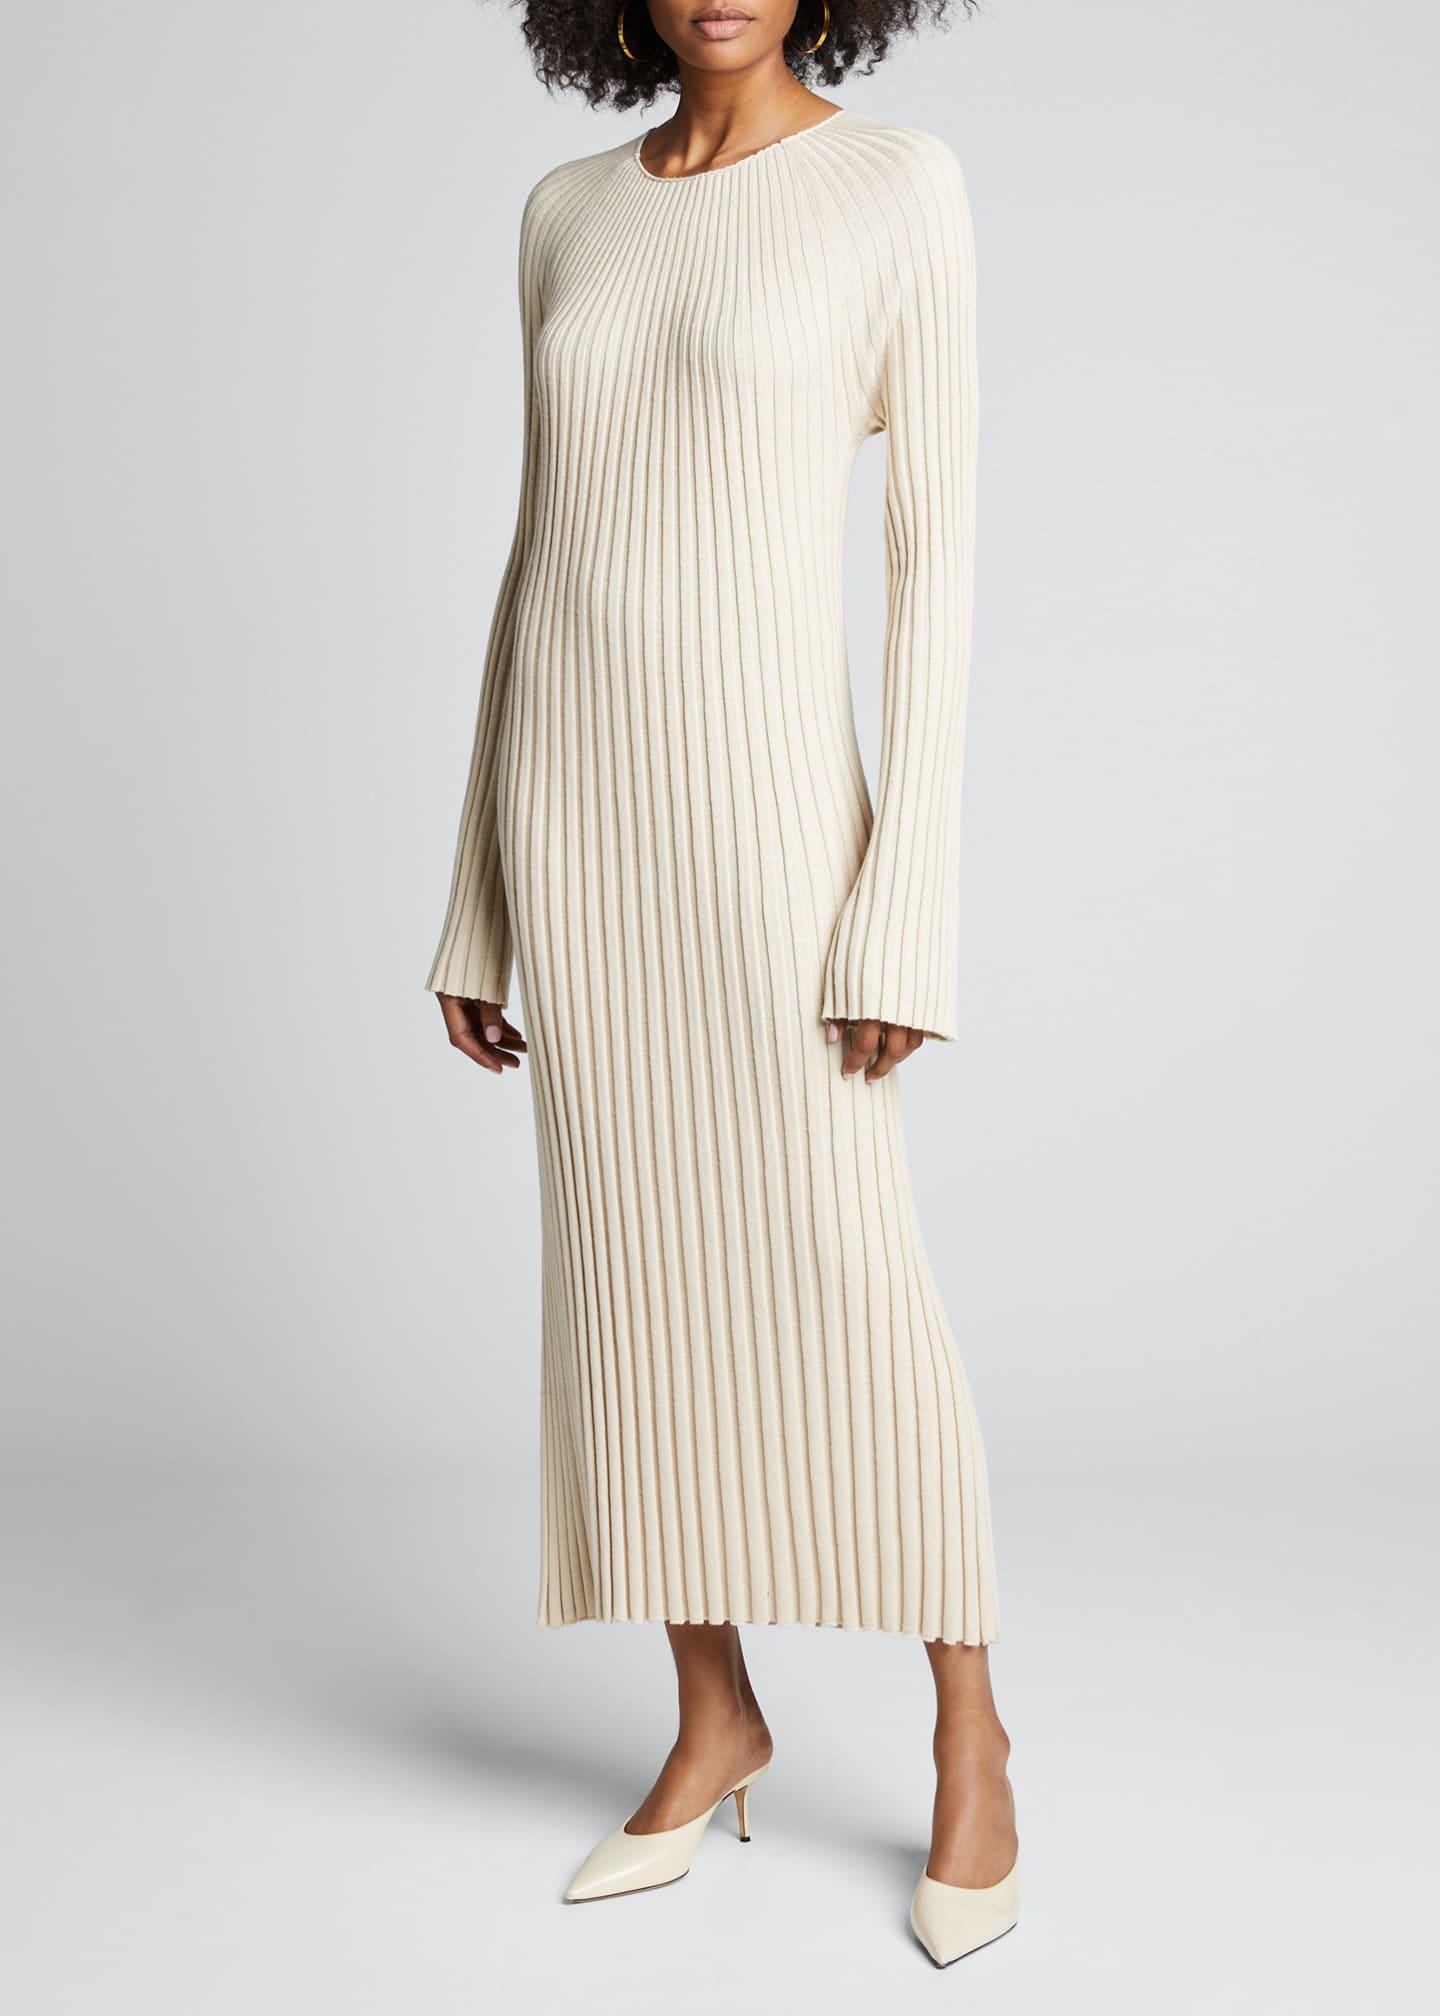 Loulou Studio Ribbed Maxi Sweater Dress